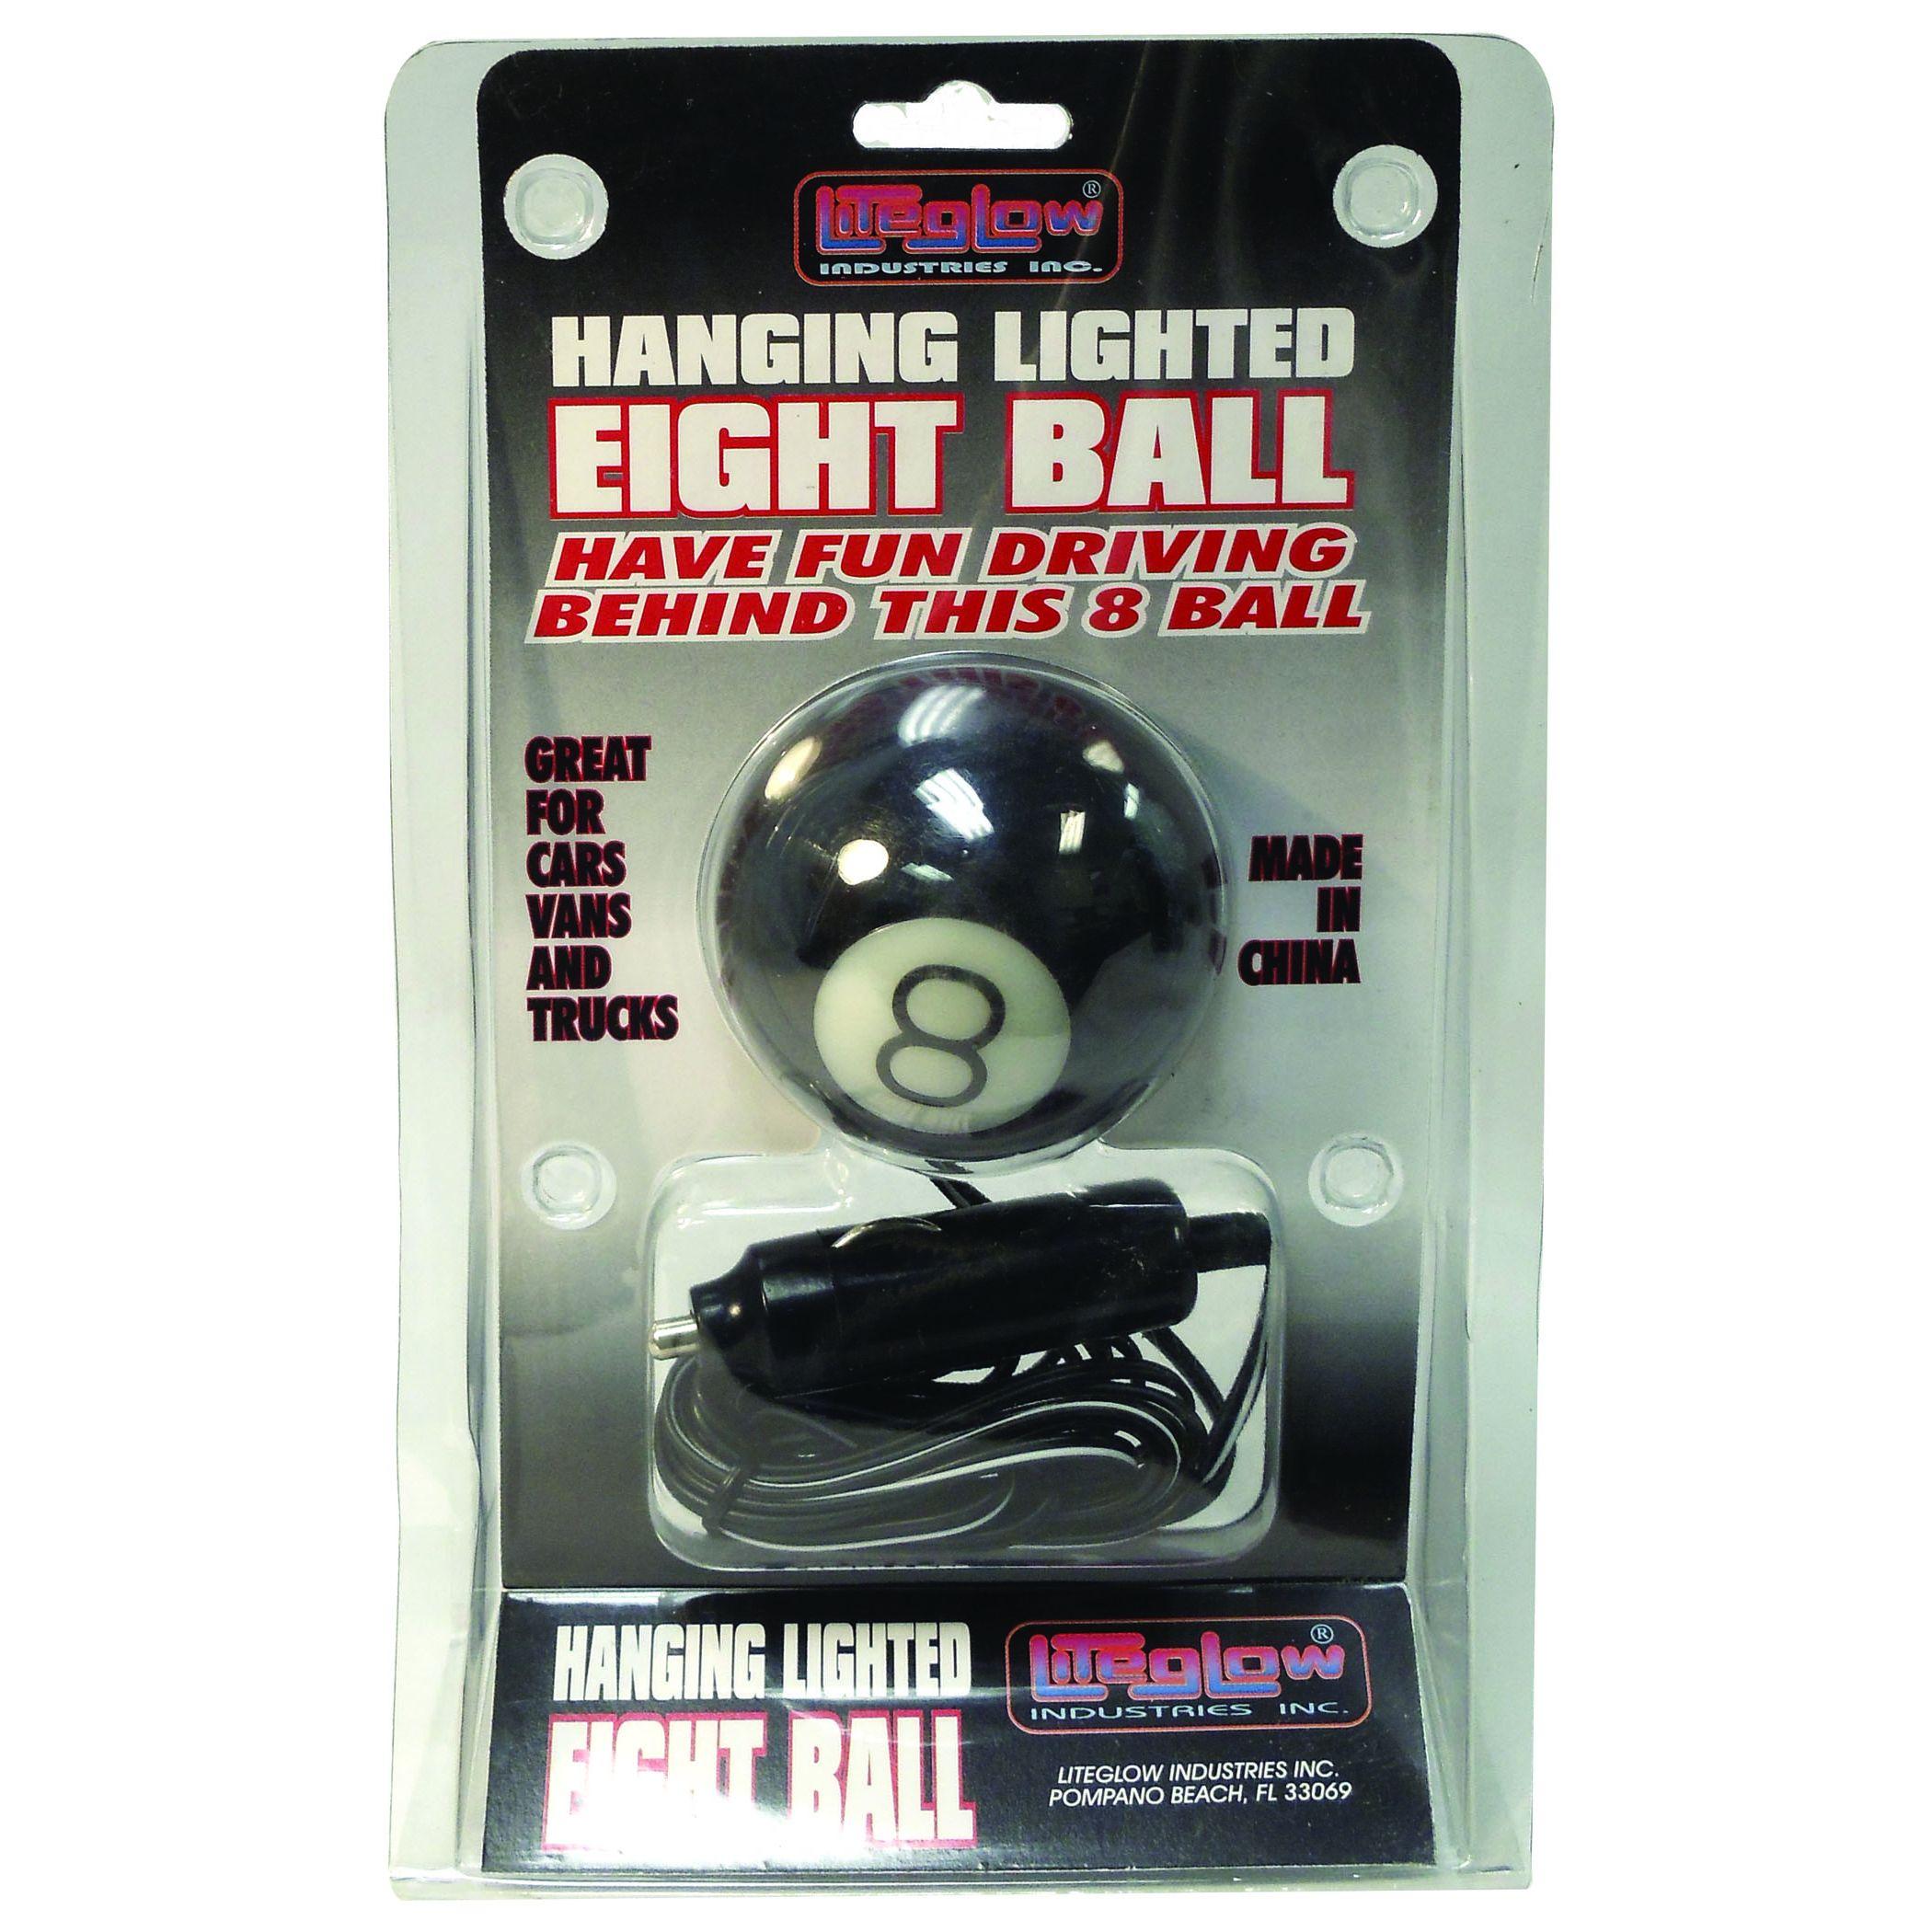 024BLL88 - Hanging Lighted Eight Ball 12V